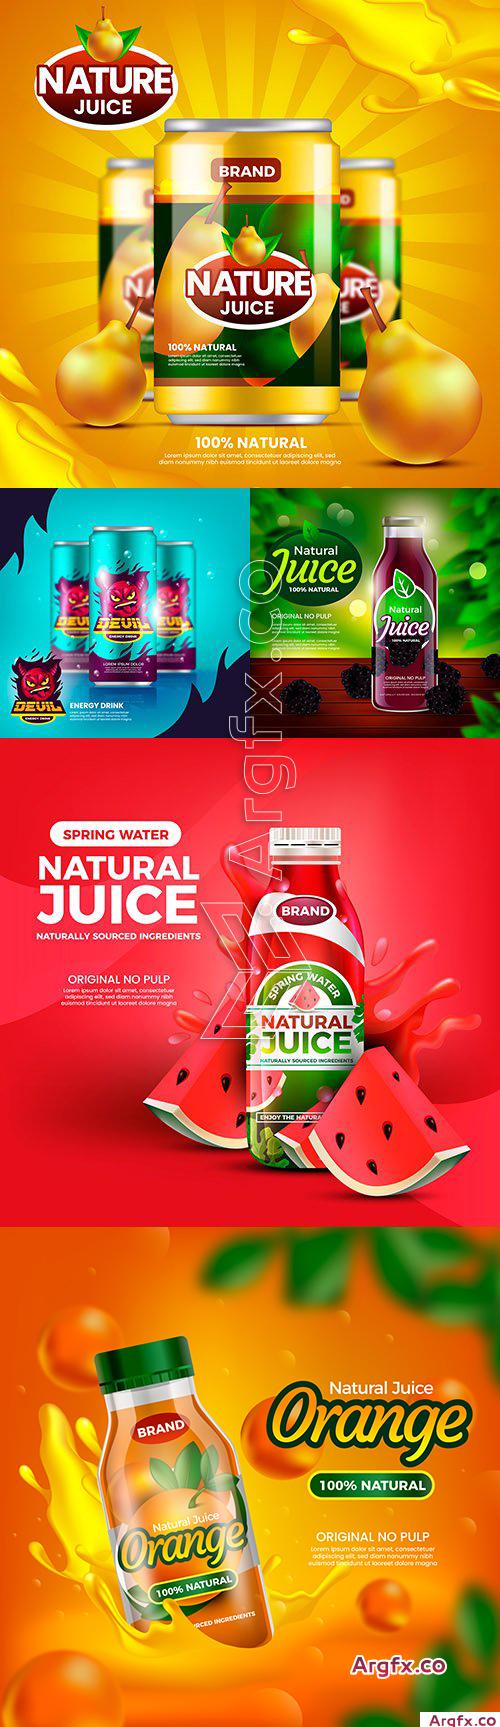 Natural fruit juice and energetic beverage illustration